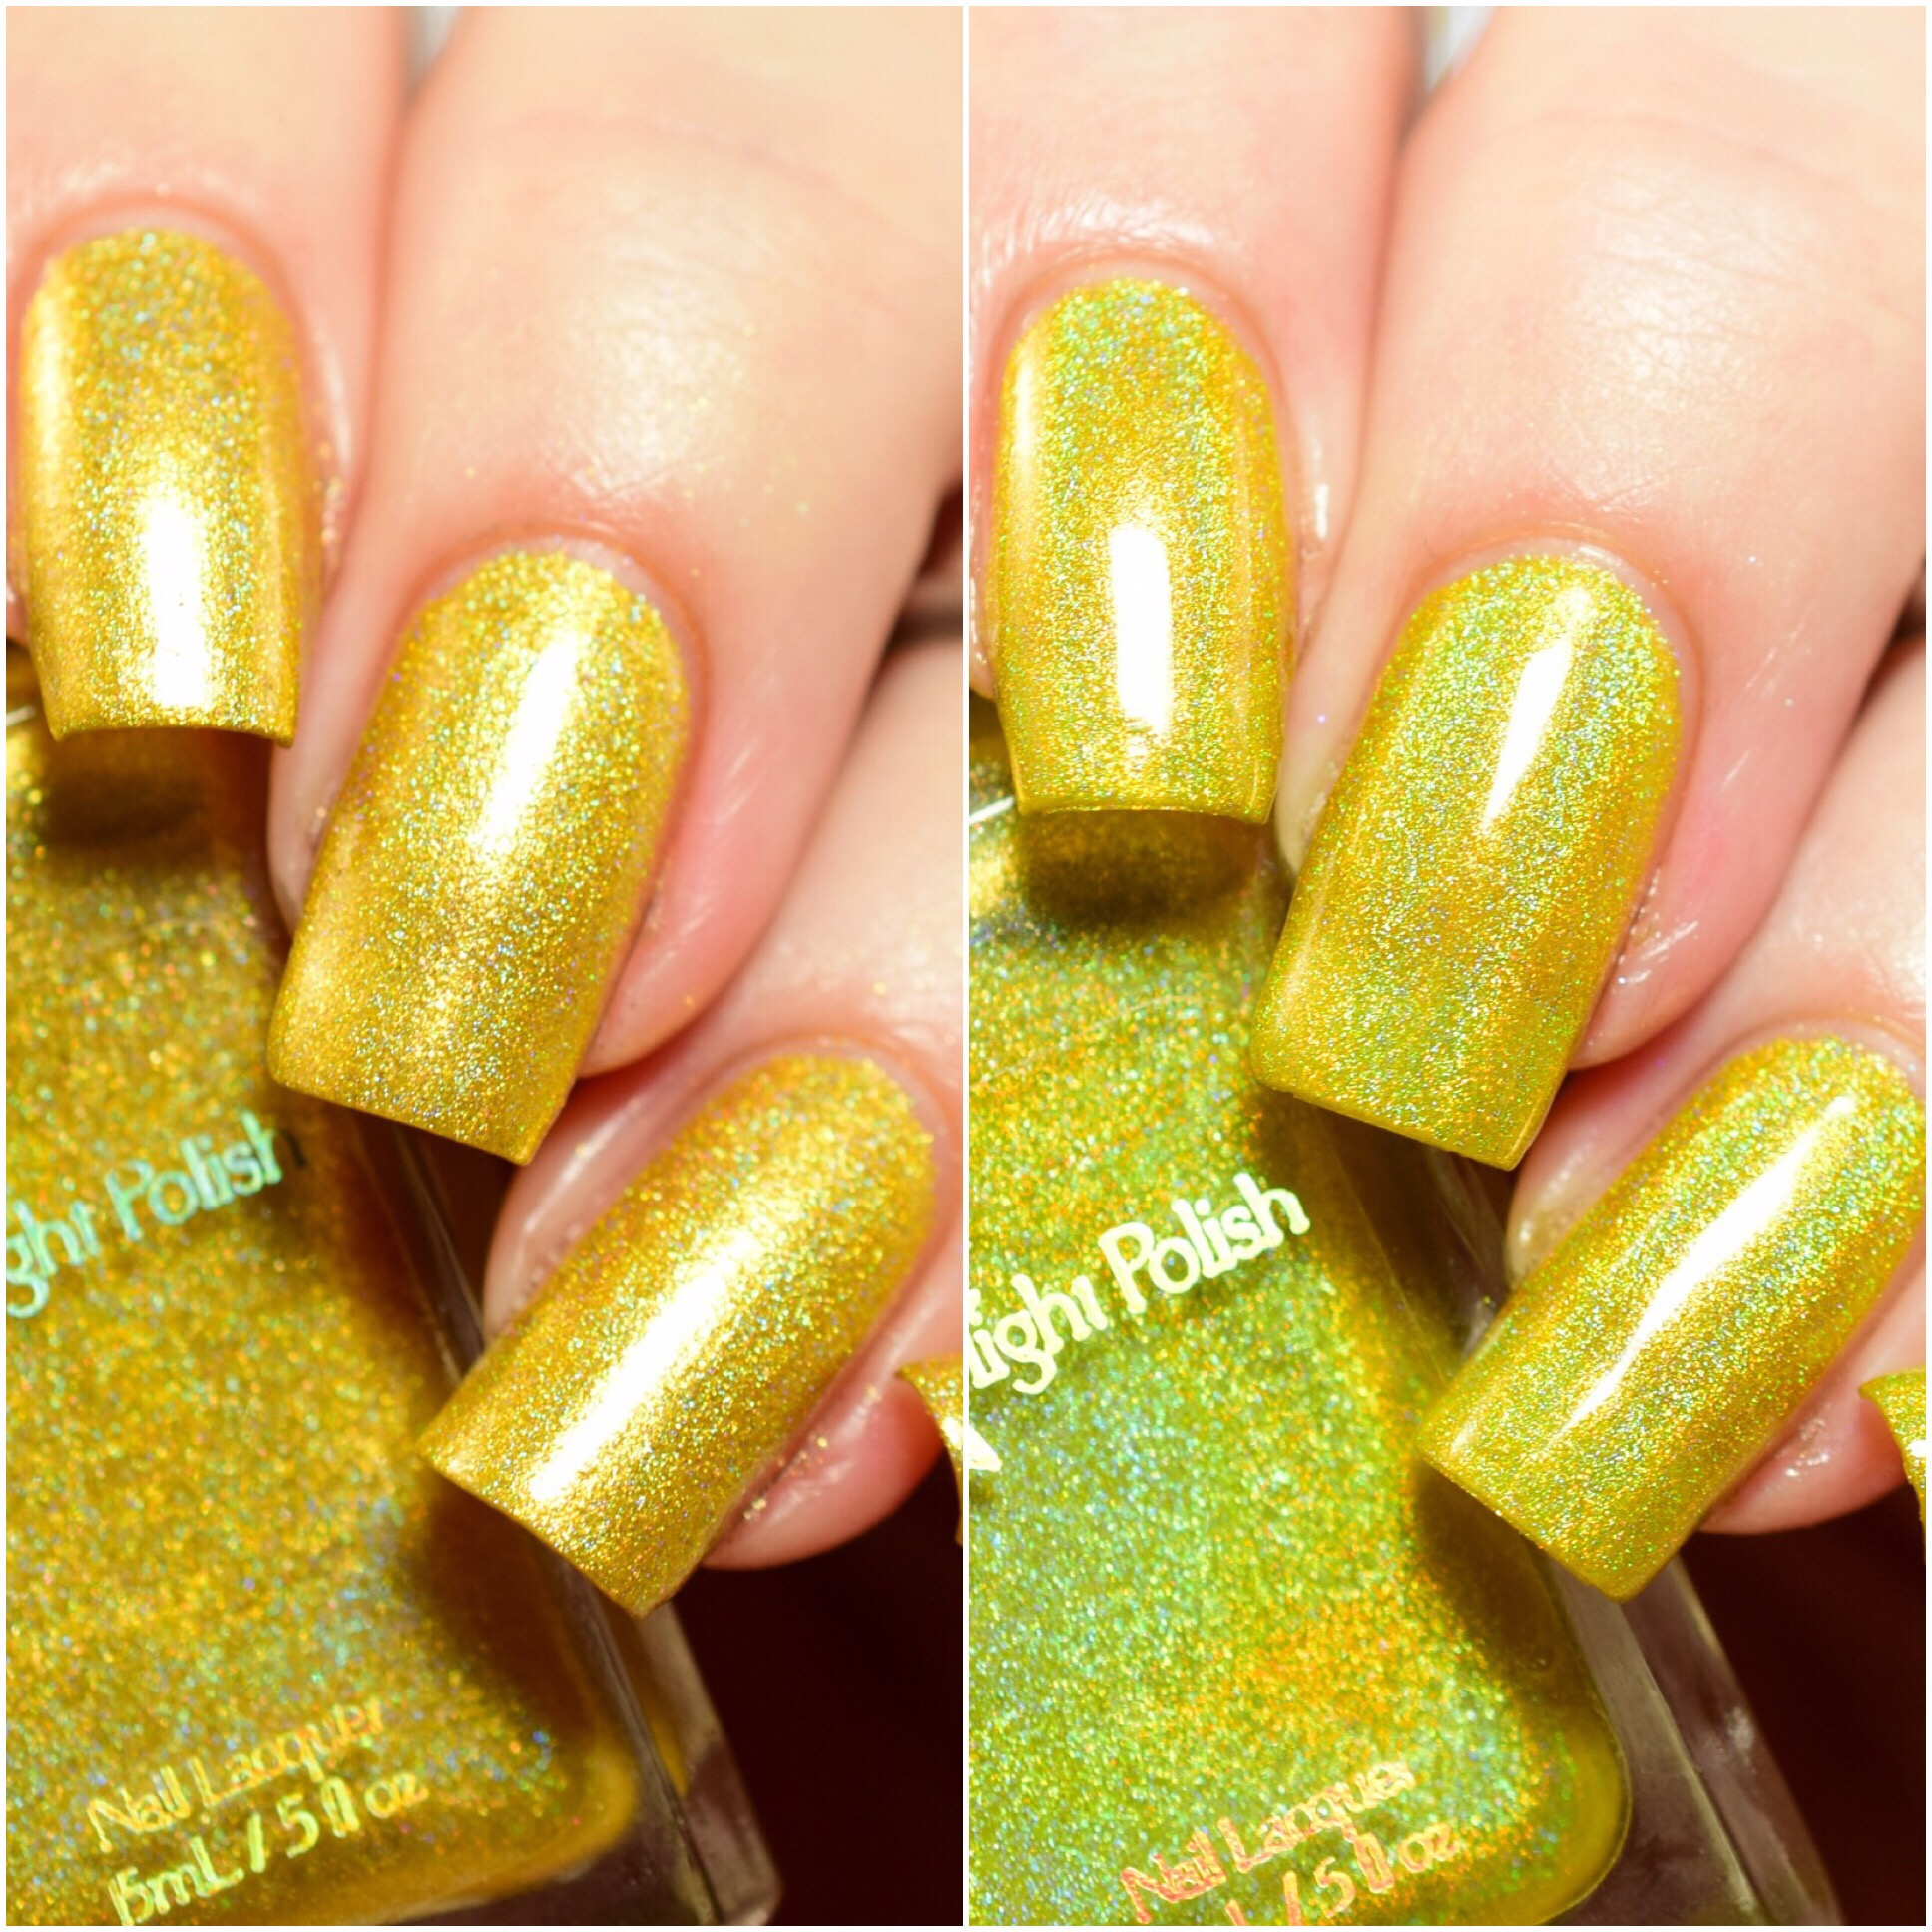 Starlight Polish Golden Rings vs Candle Lights